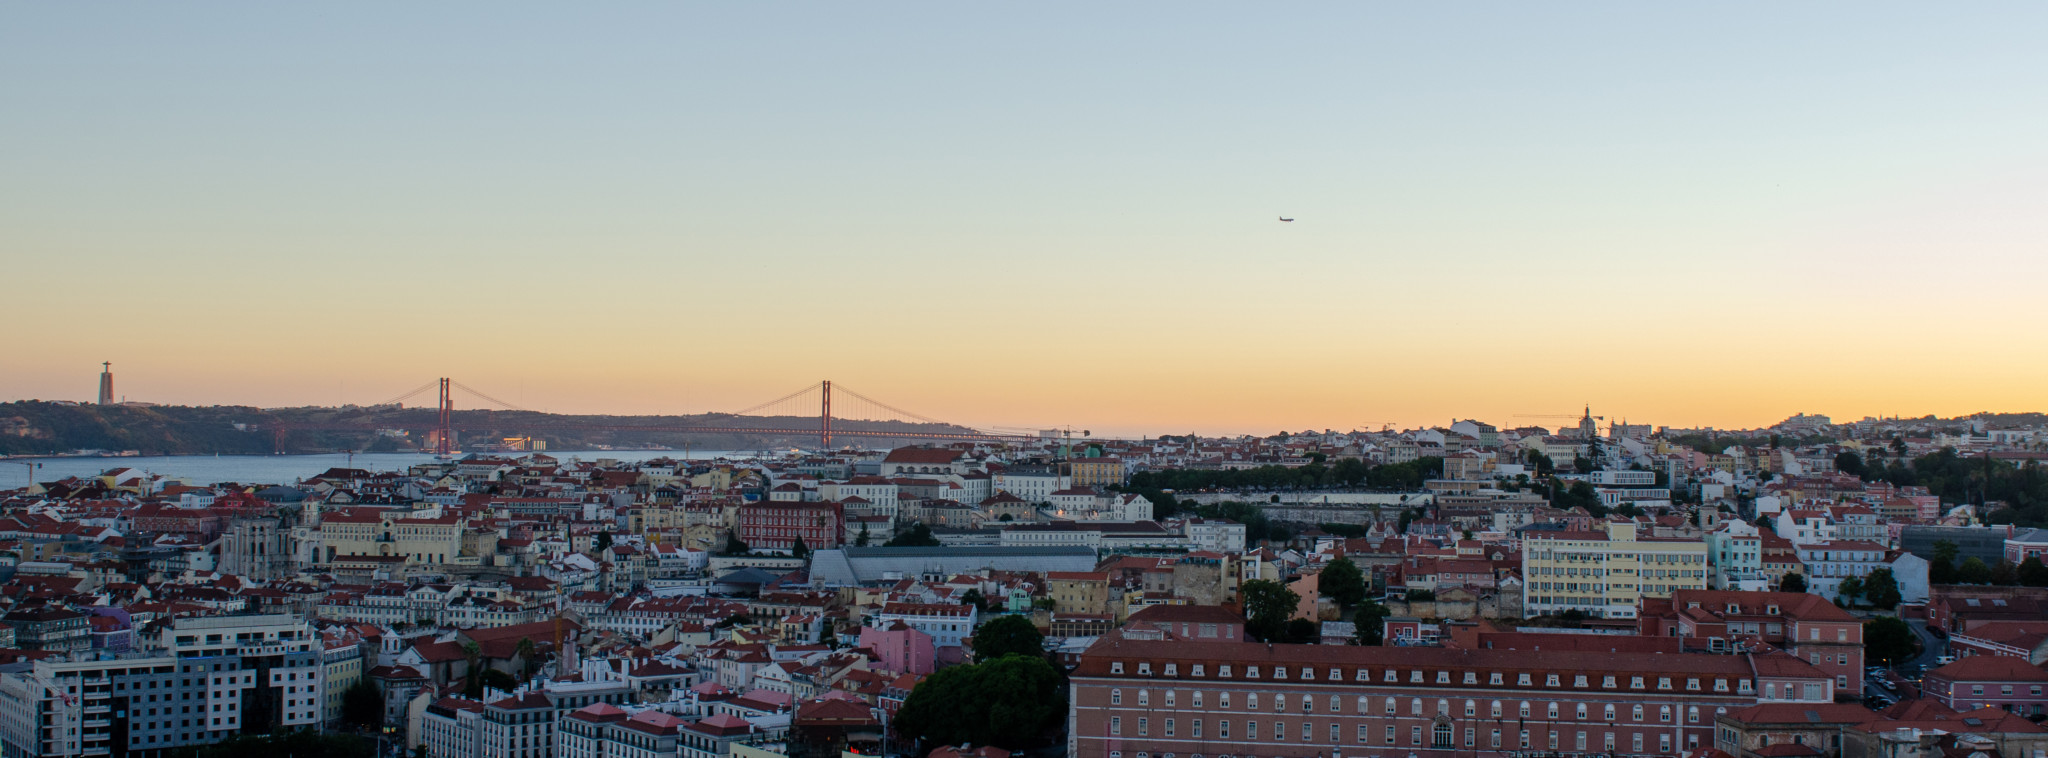 Sonnenuntergang über Lissabon